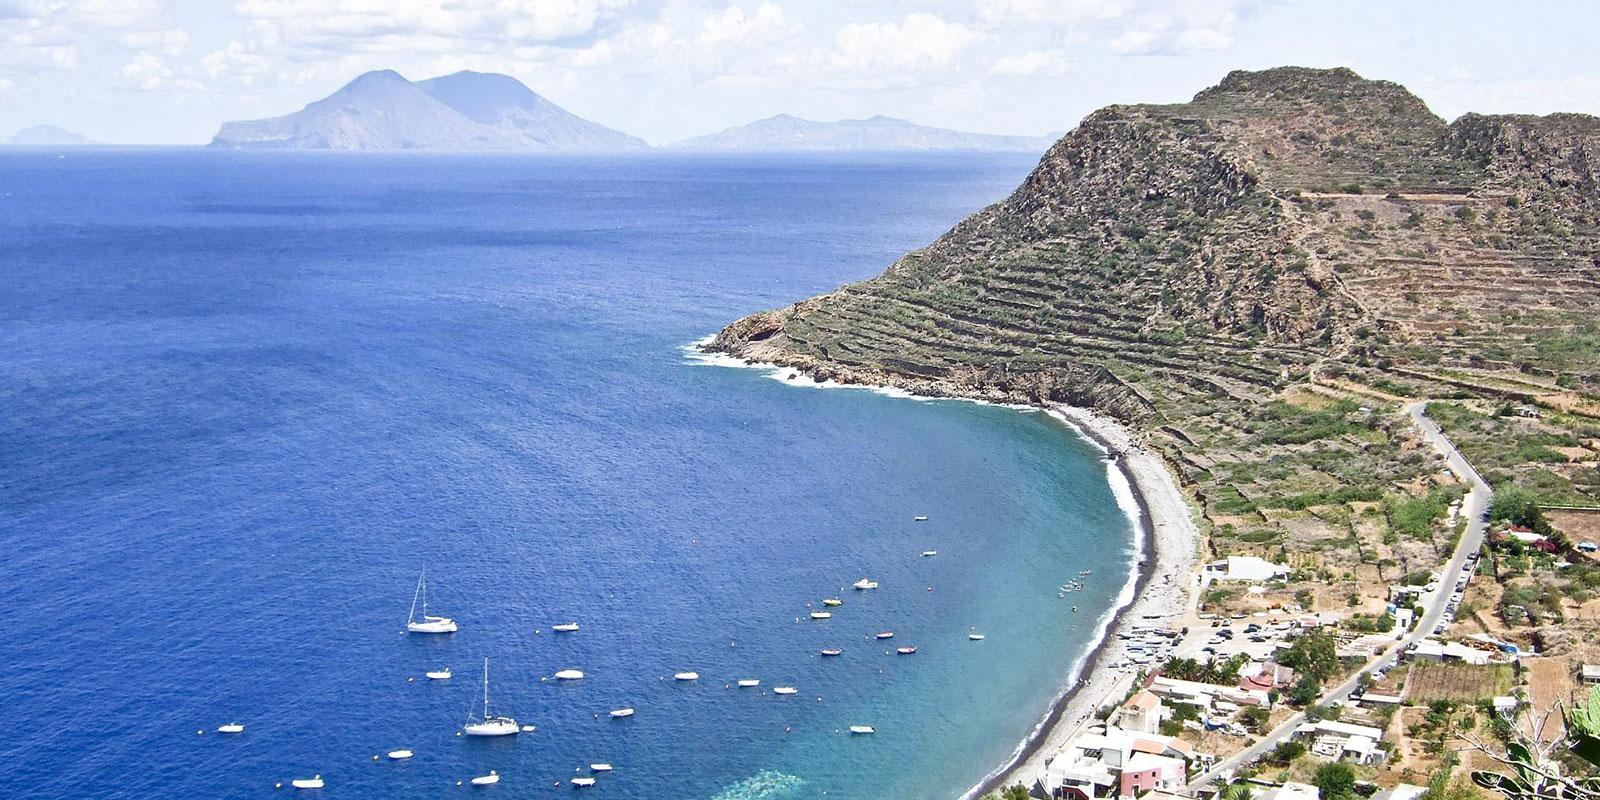 Hotel villa morgana resort spa filicudi alicudi - Bagno punta canna sottomarina ...